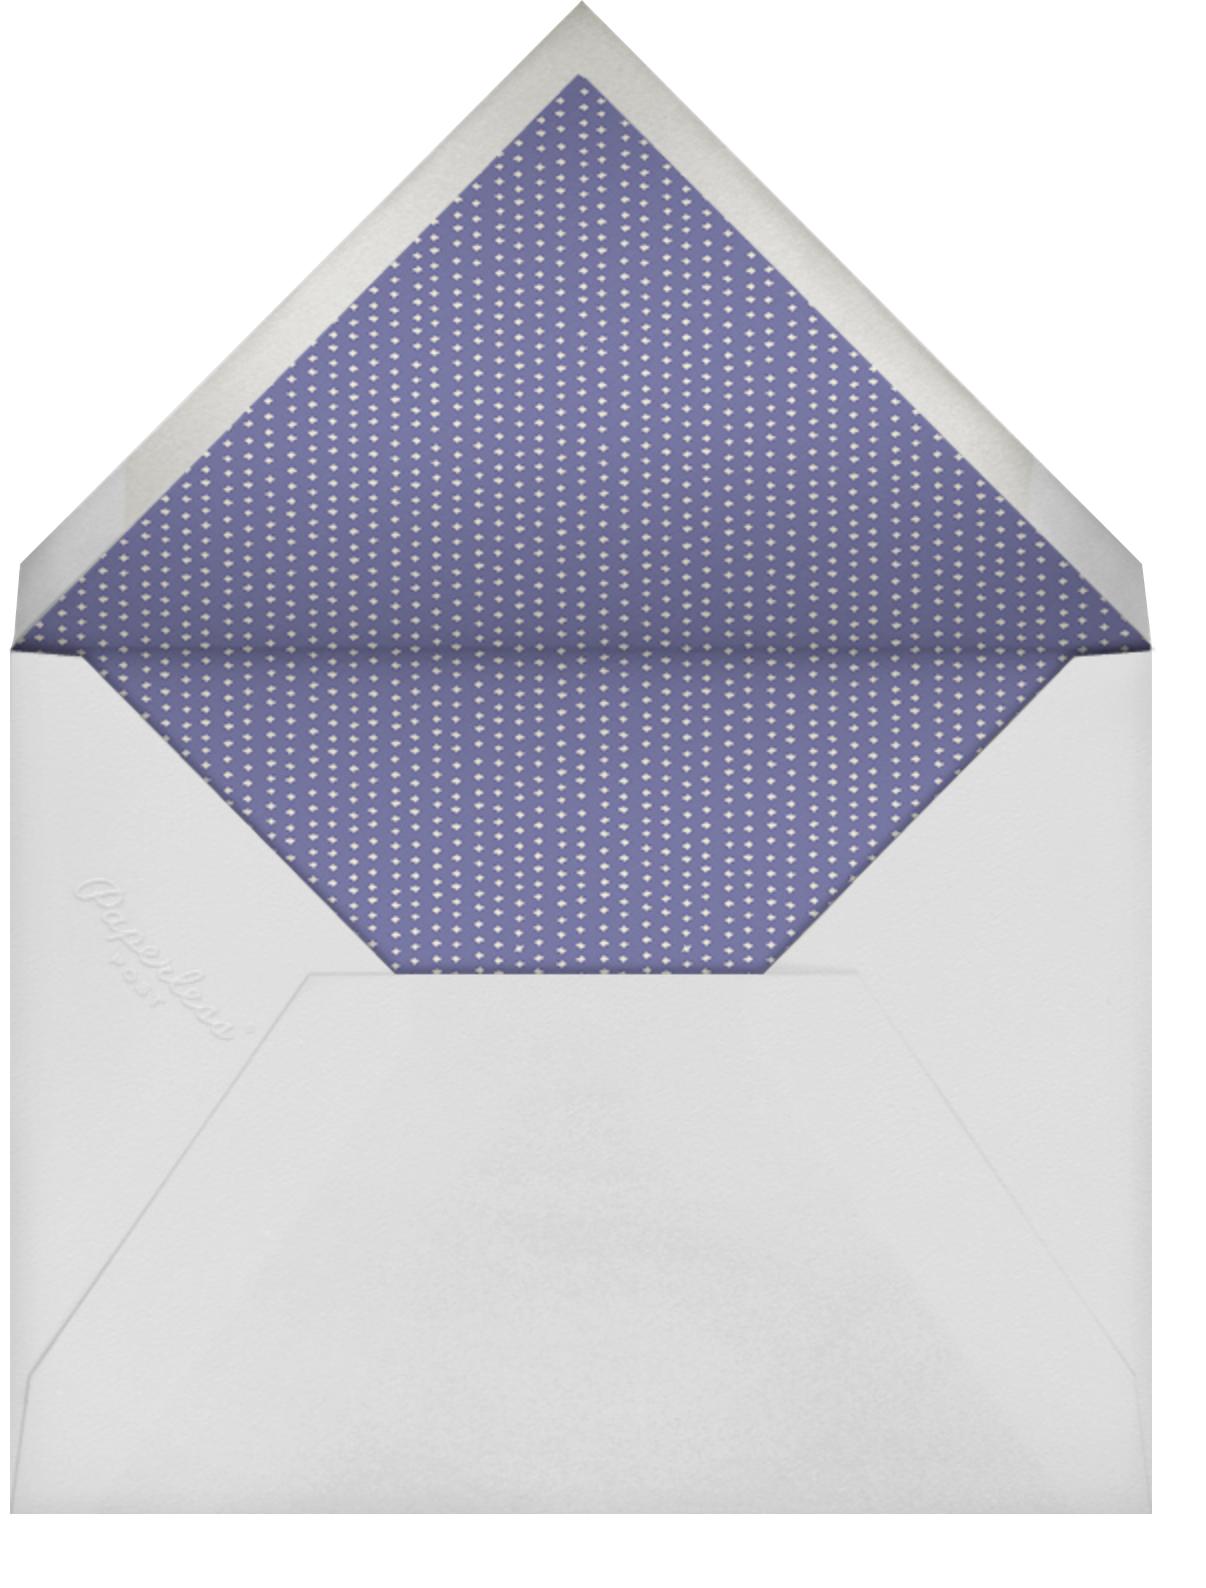 High Tea - Pink - Paperless Post - Envelope